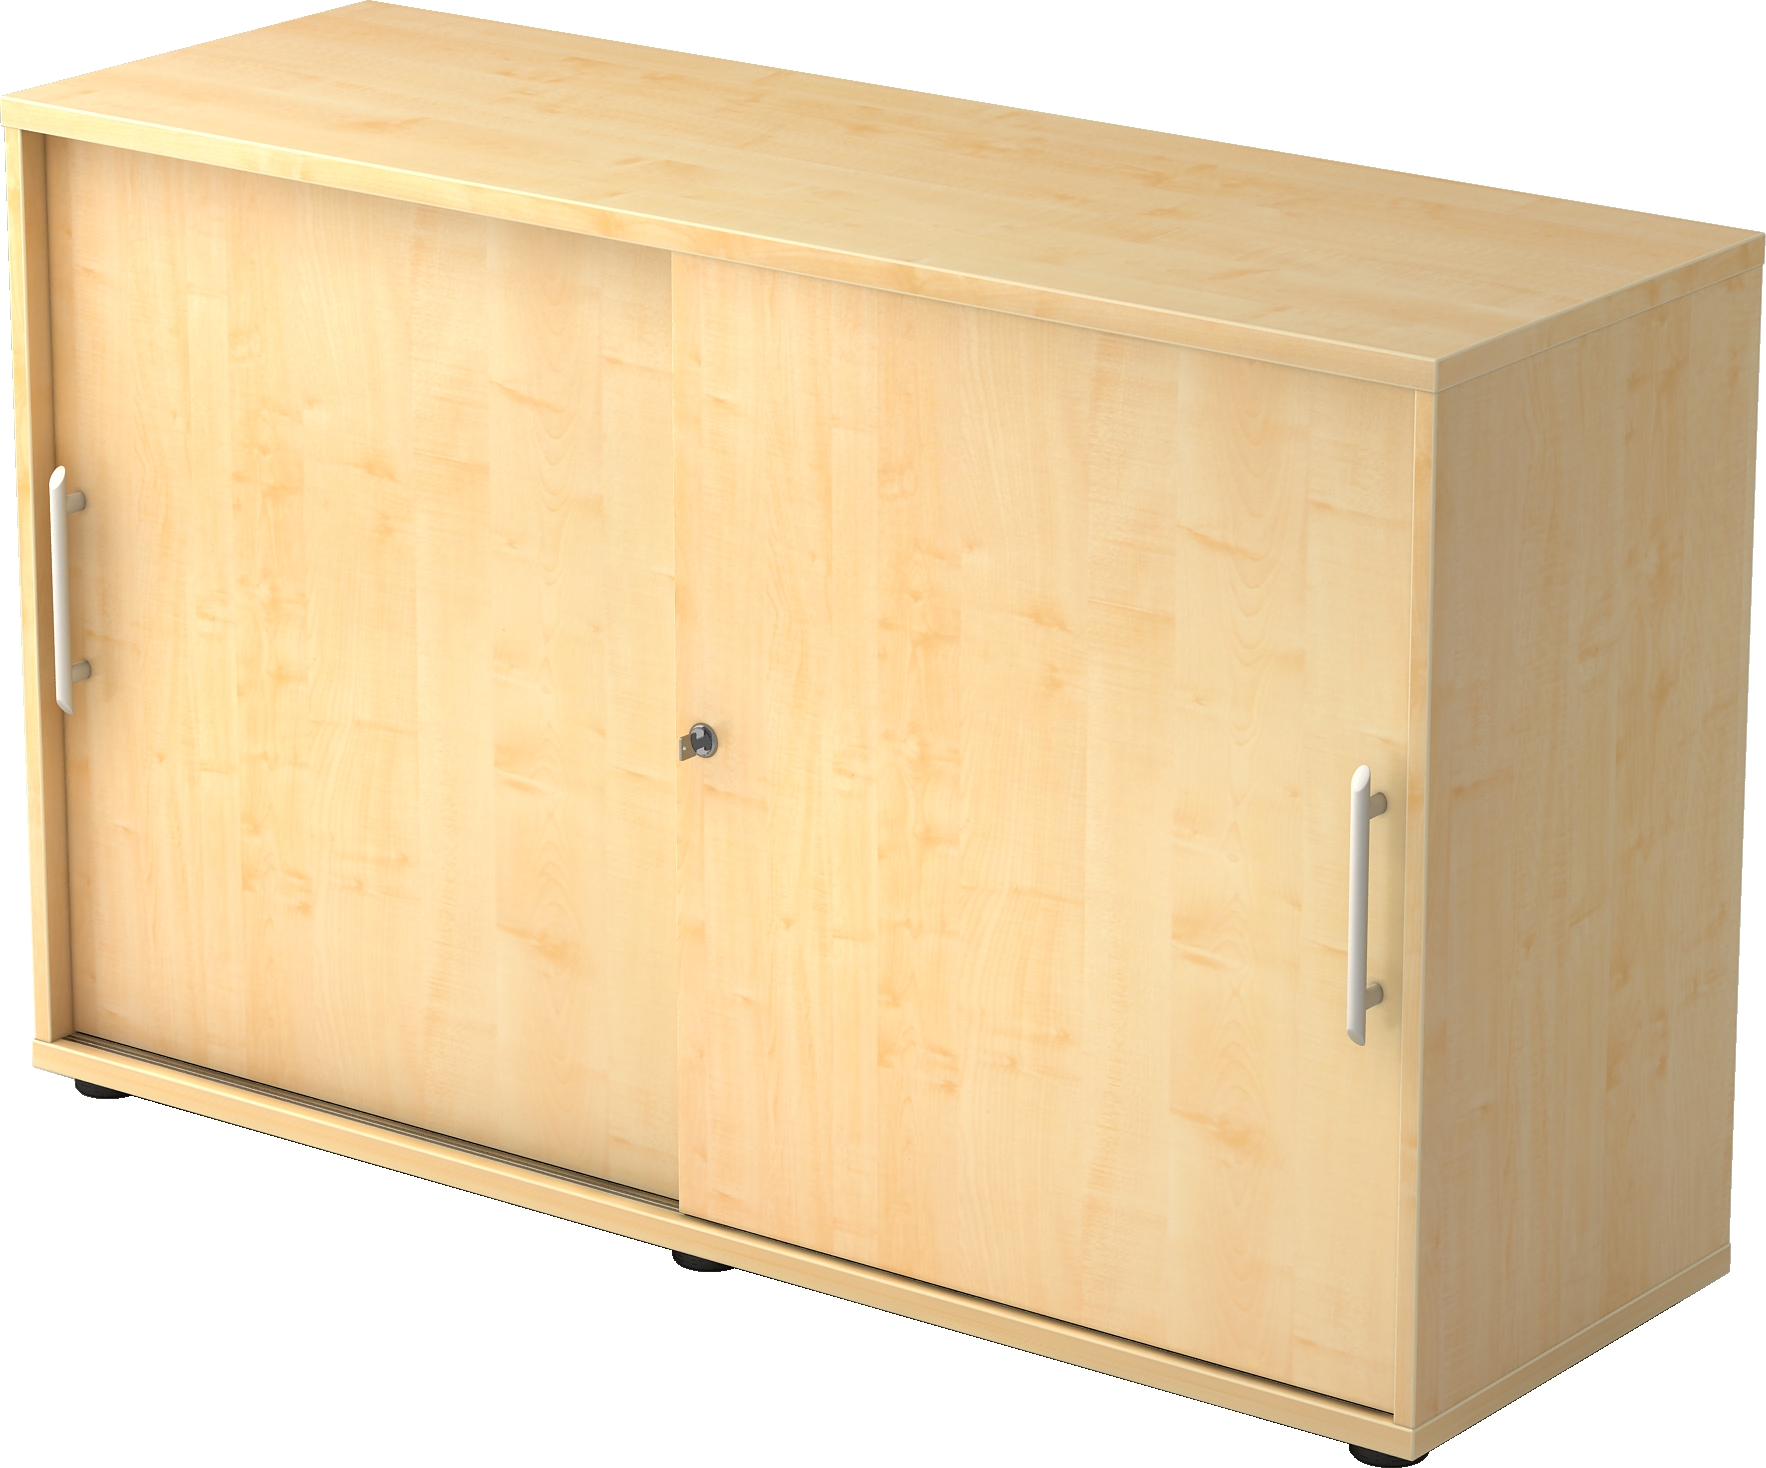 schiebet renschrank b roschrank aktenschrank abschlie bar. Black Bedroom Furniture Sets. Home Design Ideas